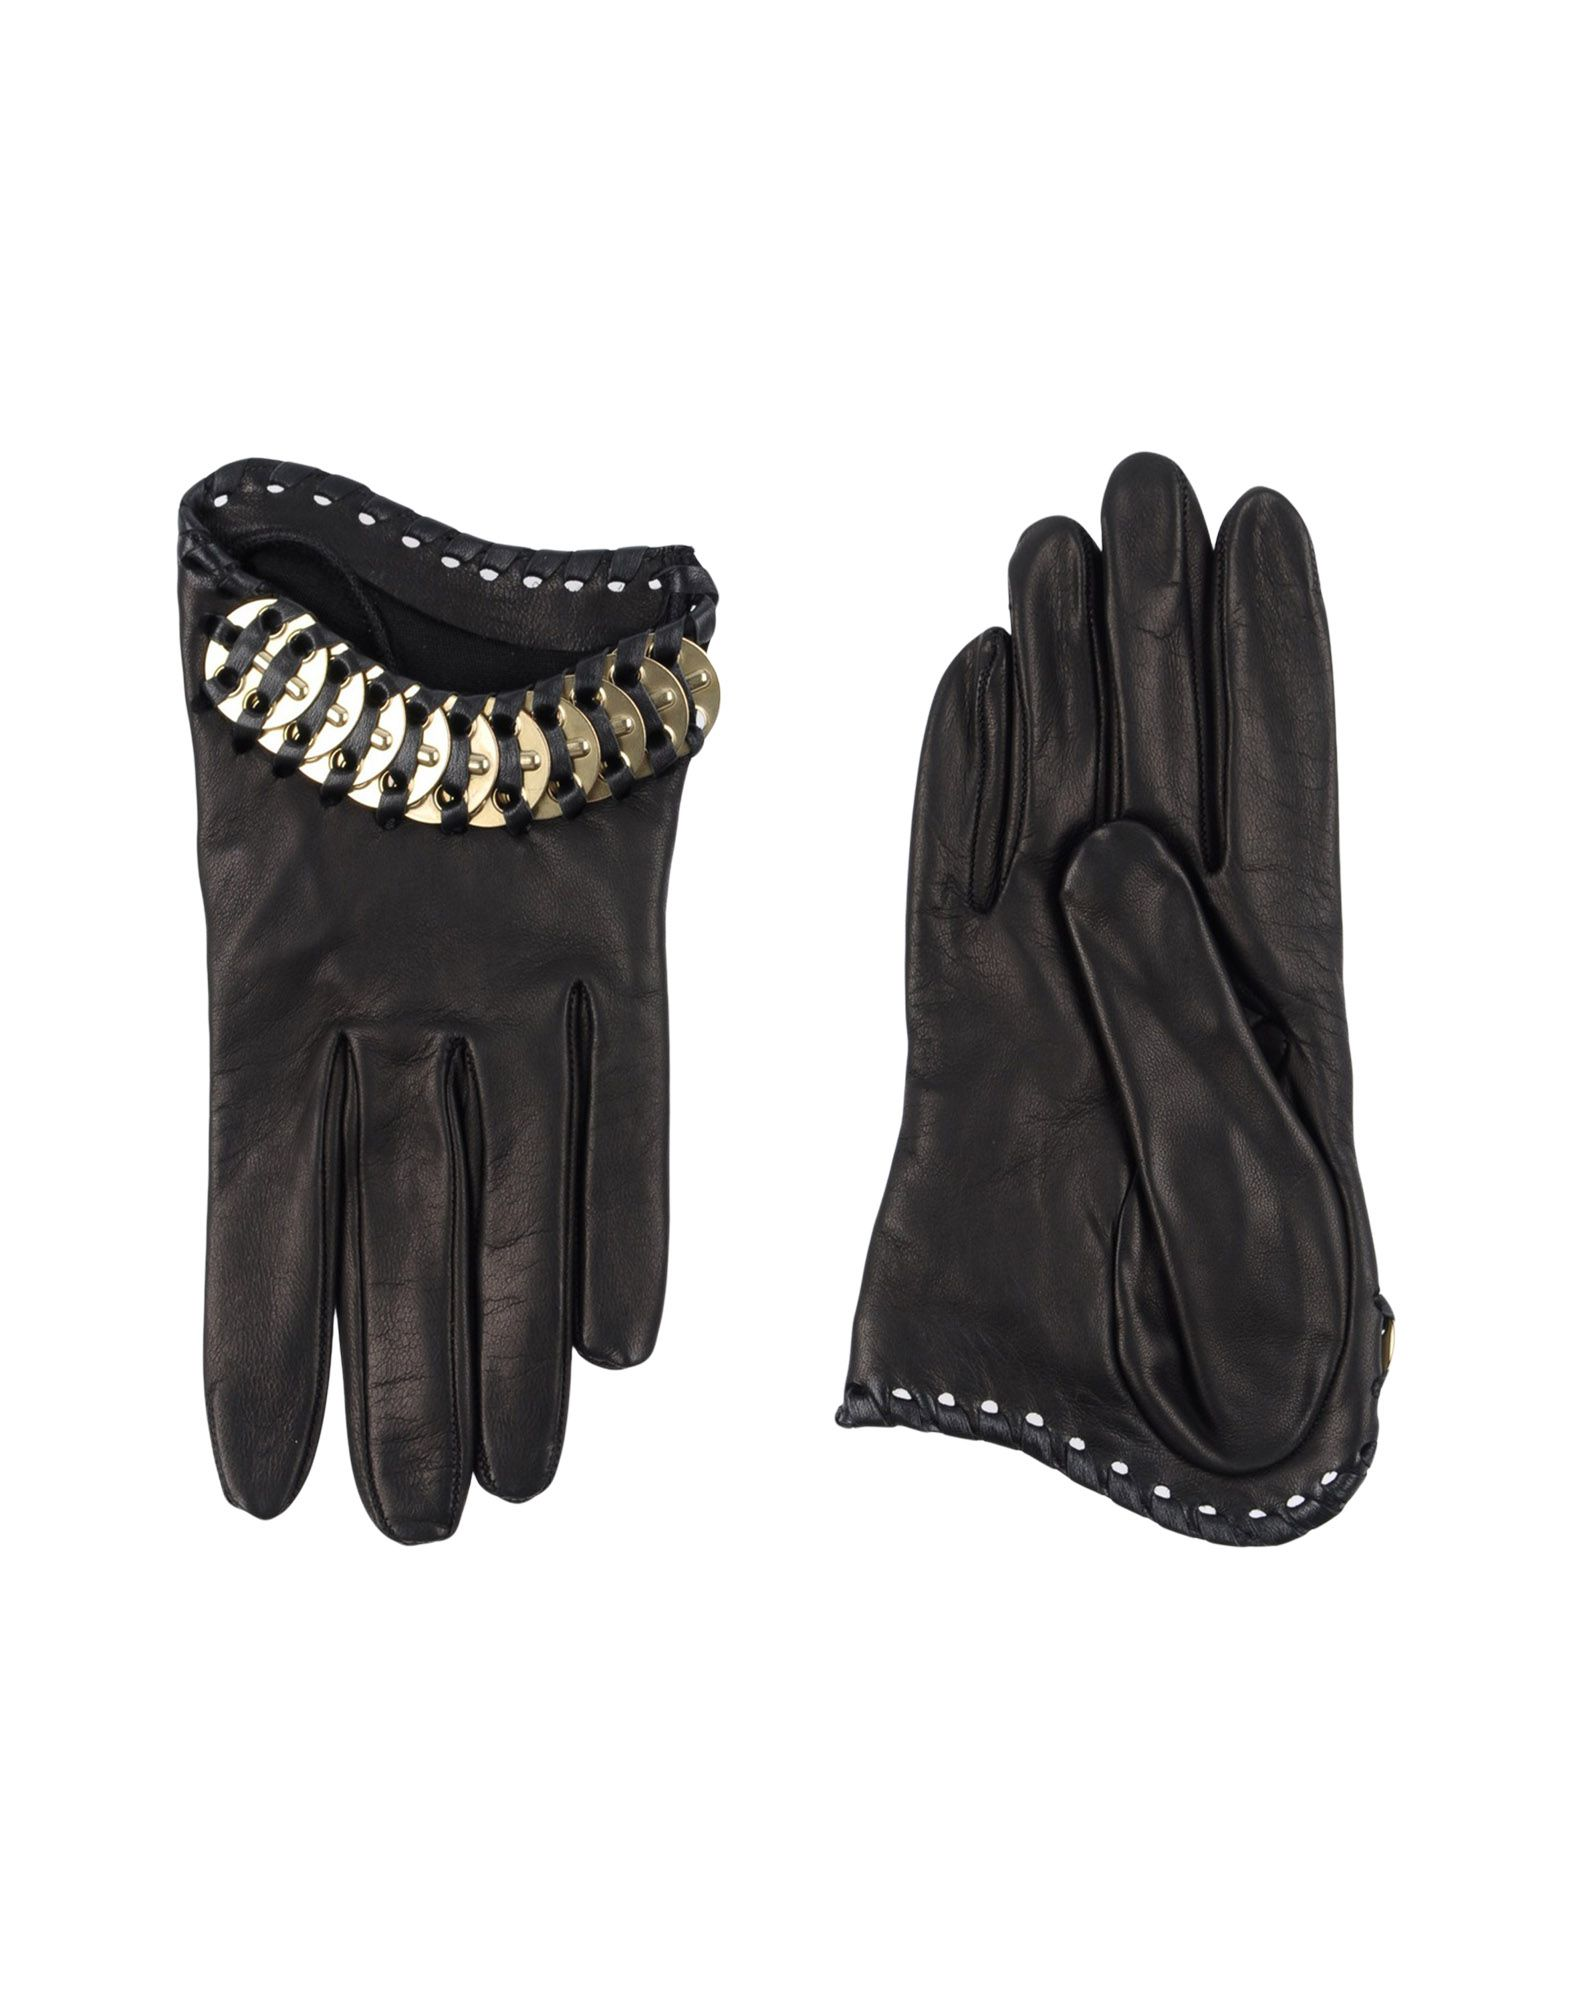 DSQUARED2 Перчатки стрельба из лука защитите перчатки 3 пальцы тянуть поклон стрелка кожа съемки перчатки